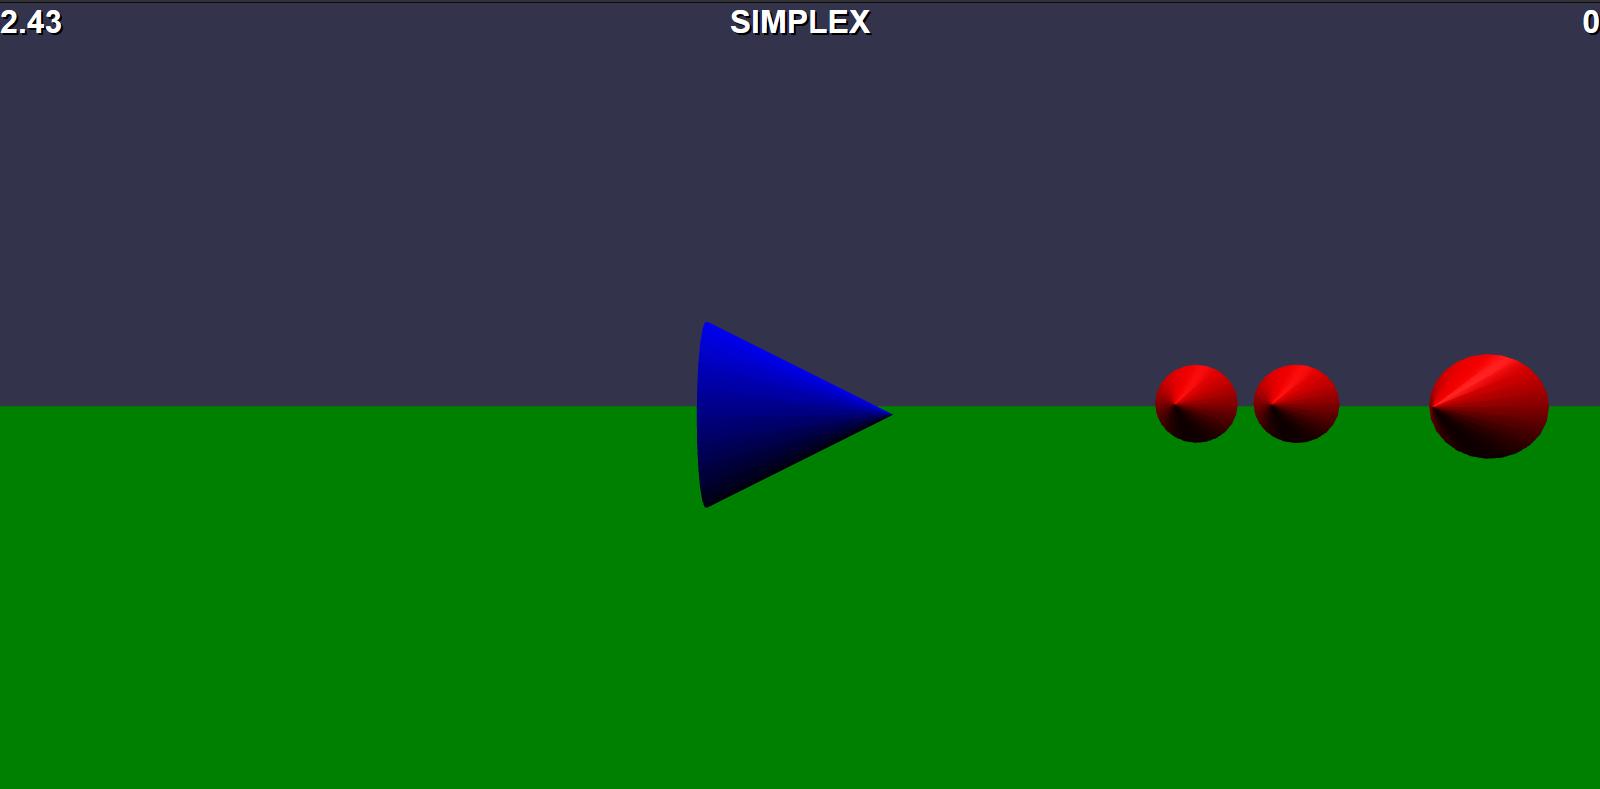 start firefox ./arcadesimplex.html